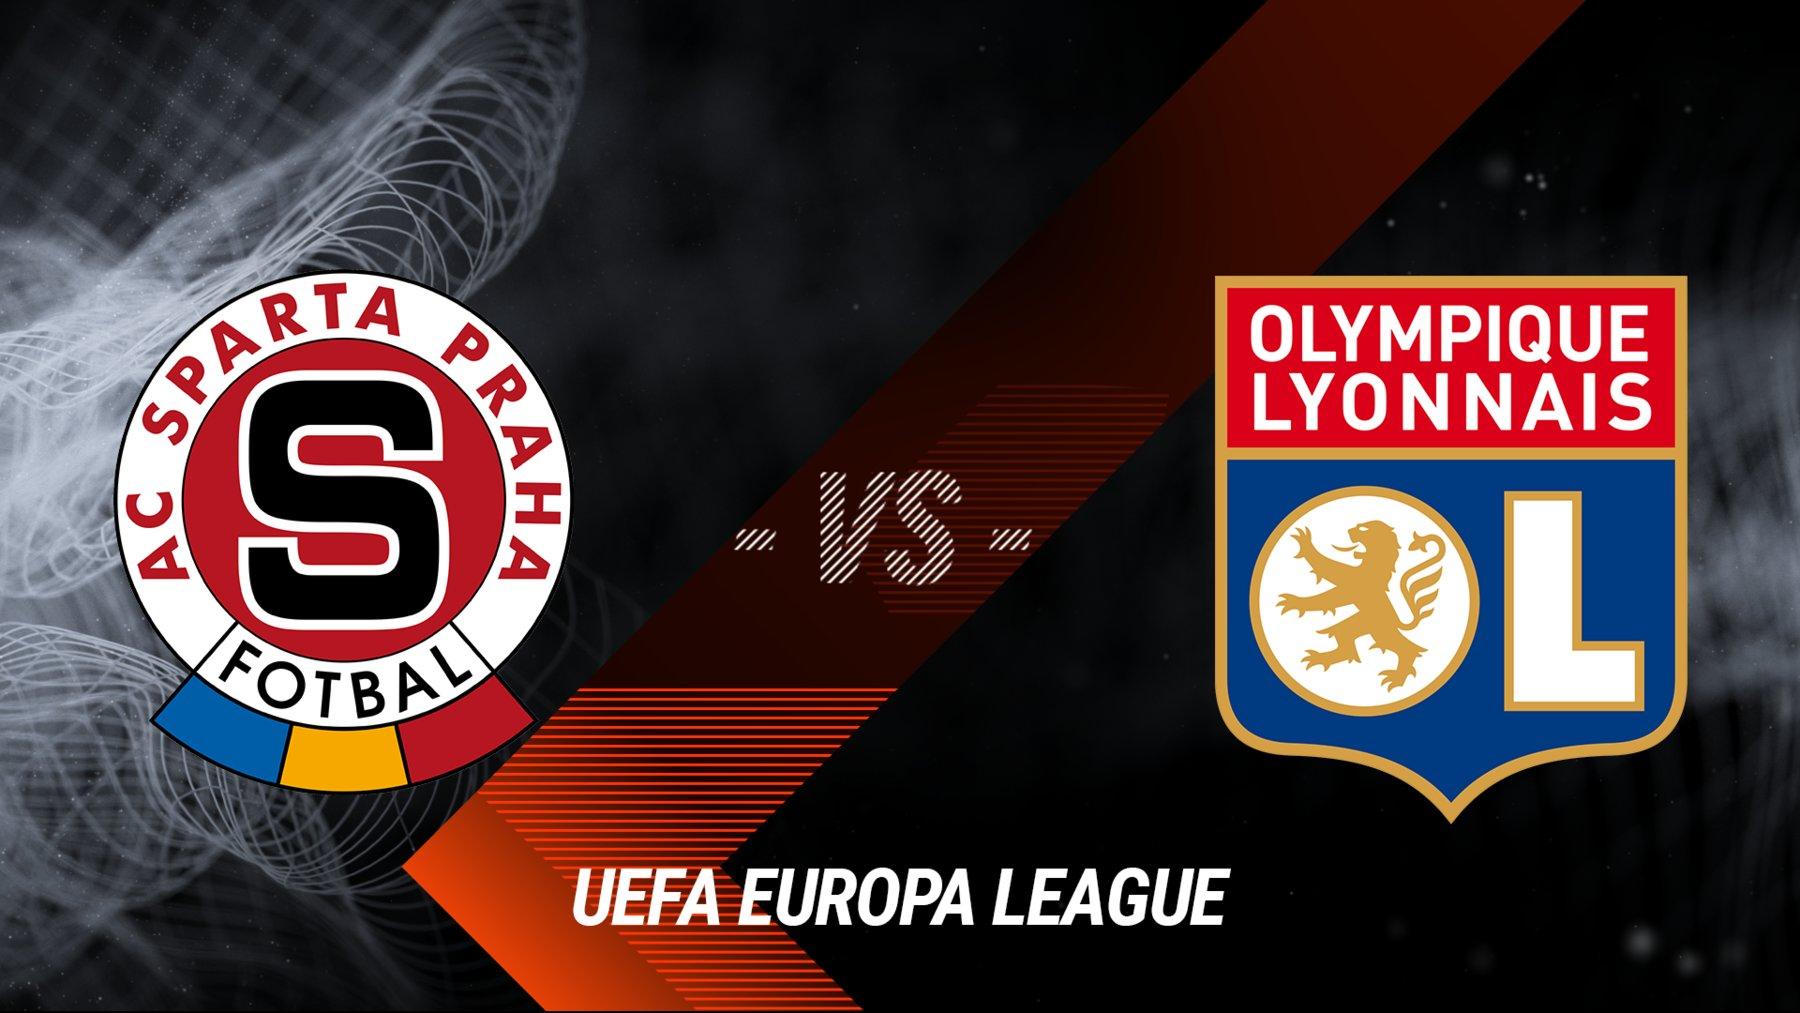 Sparta Prag vs. Olympique Lyon